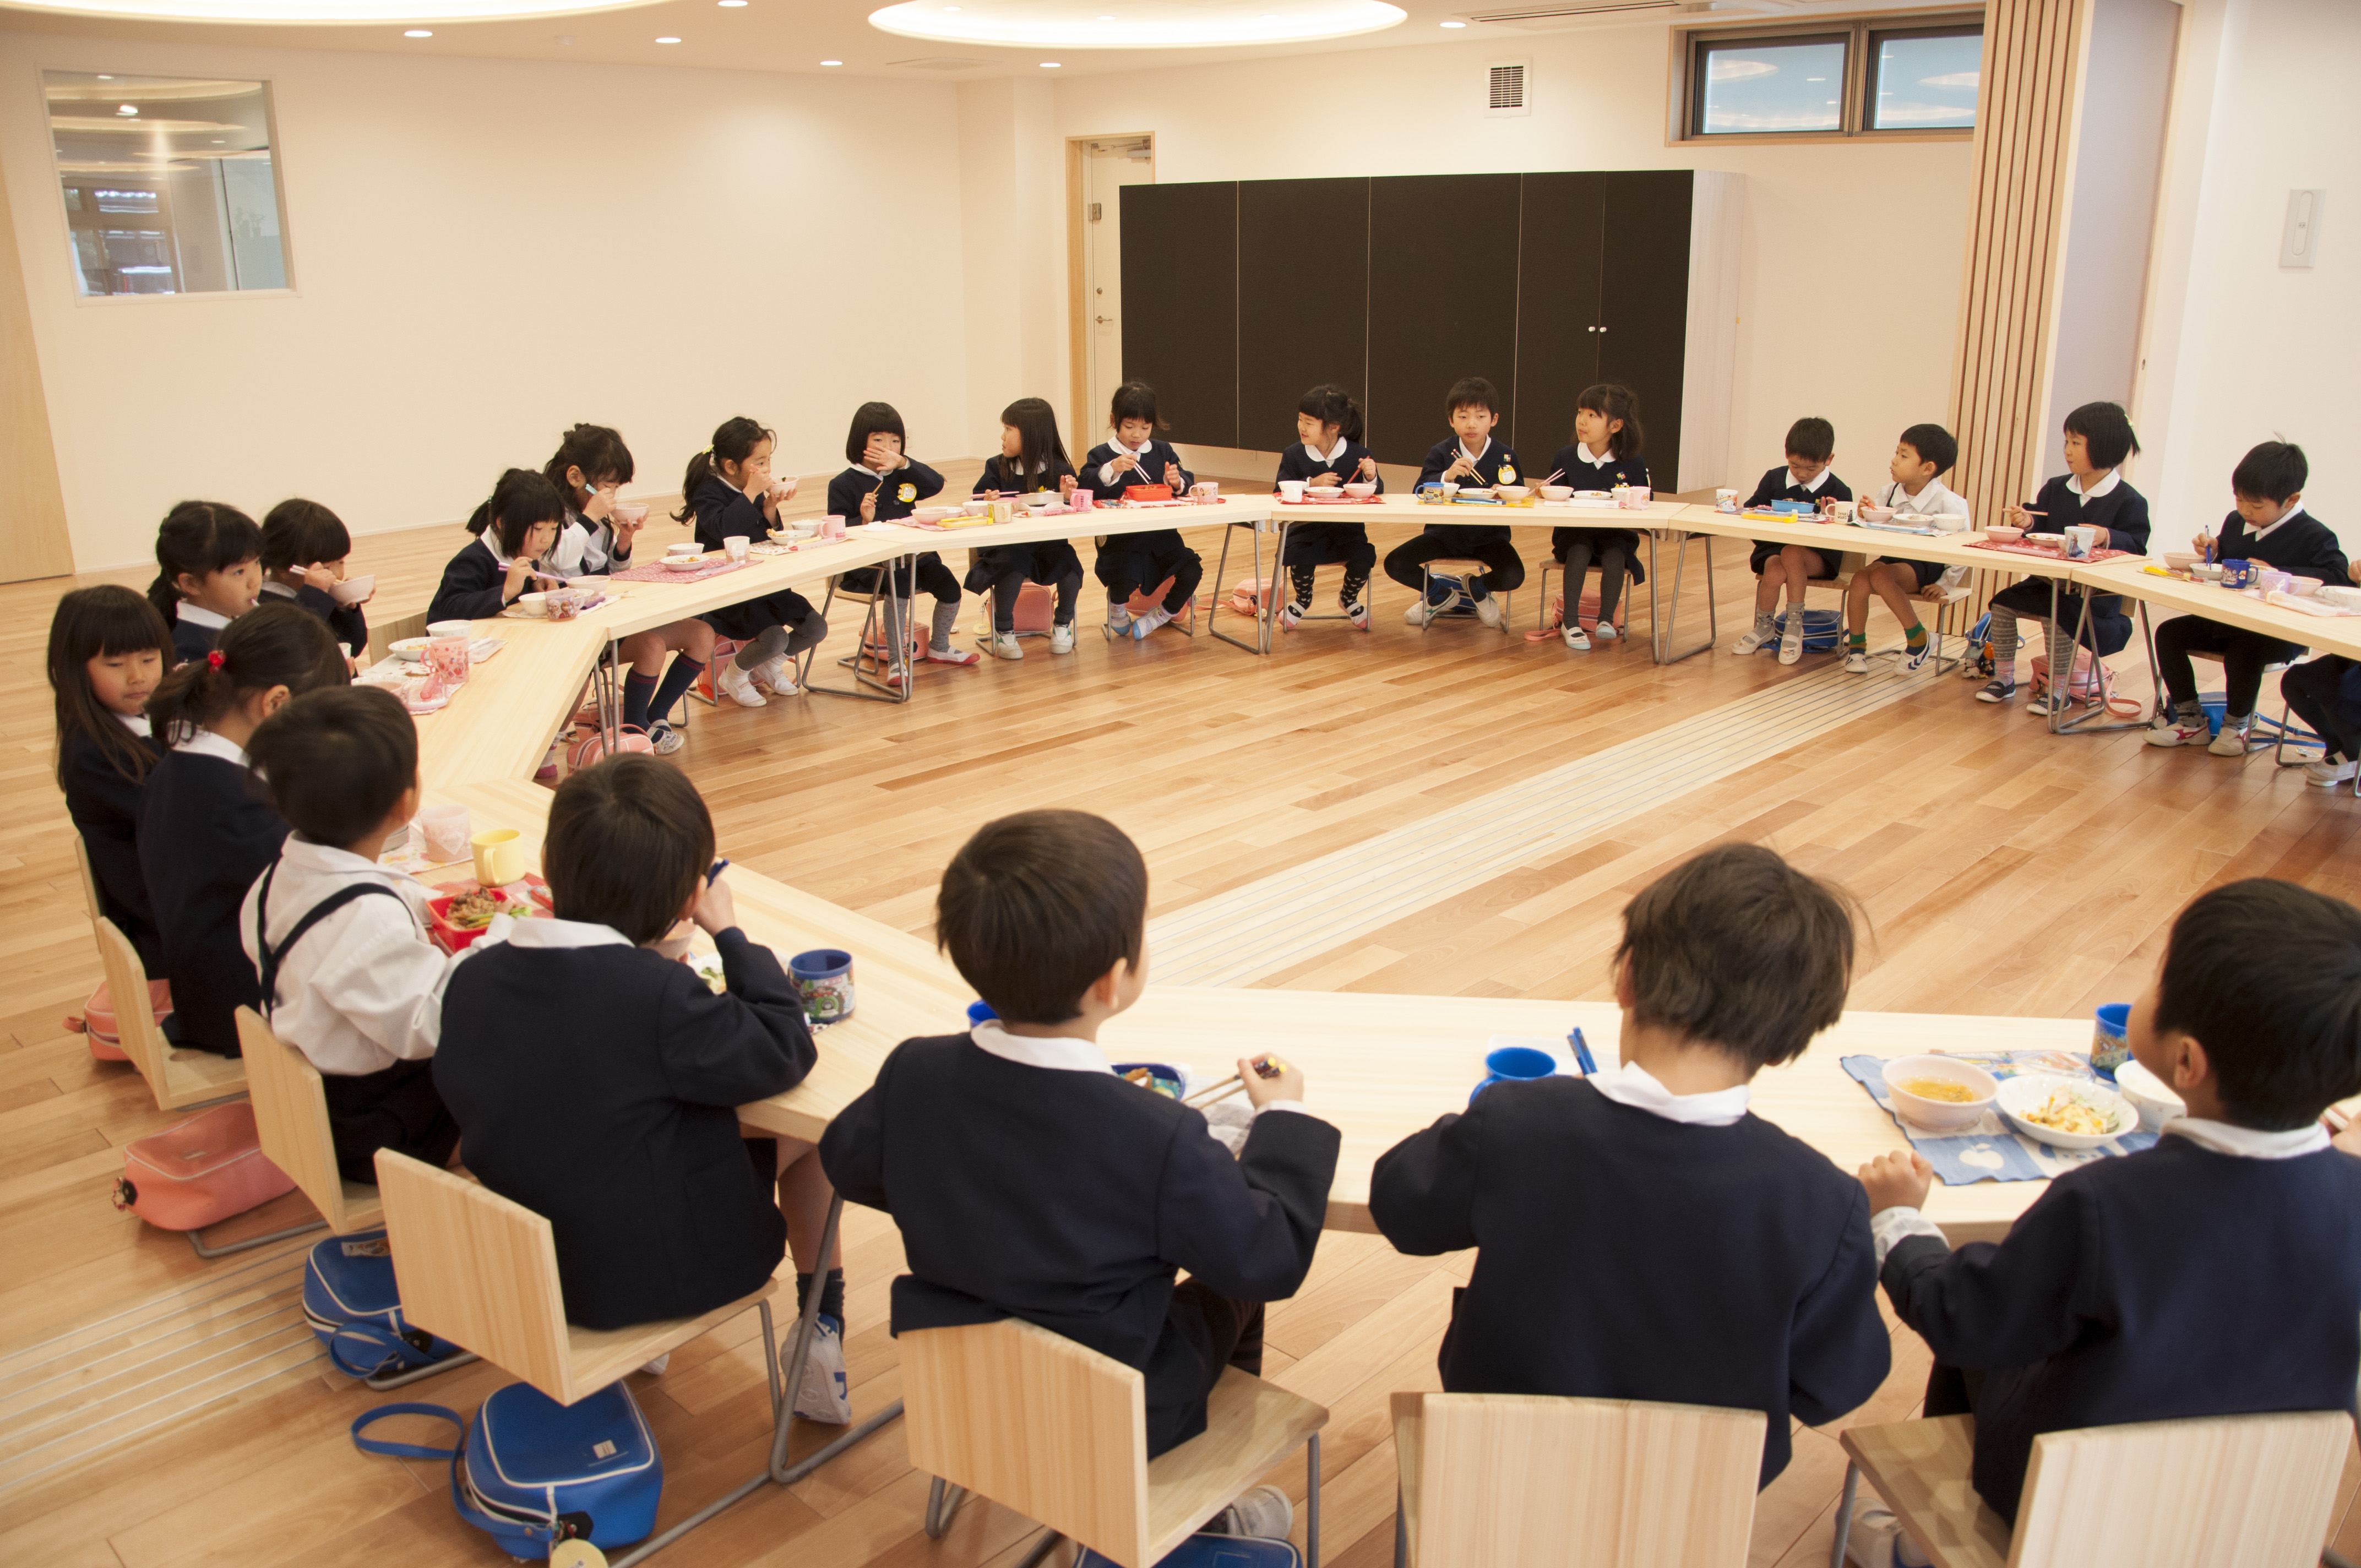 清和幼稚園 Seiwa Kindergarten